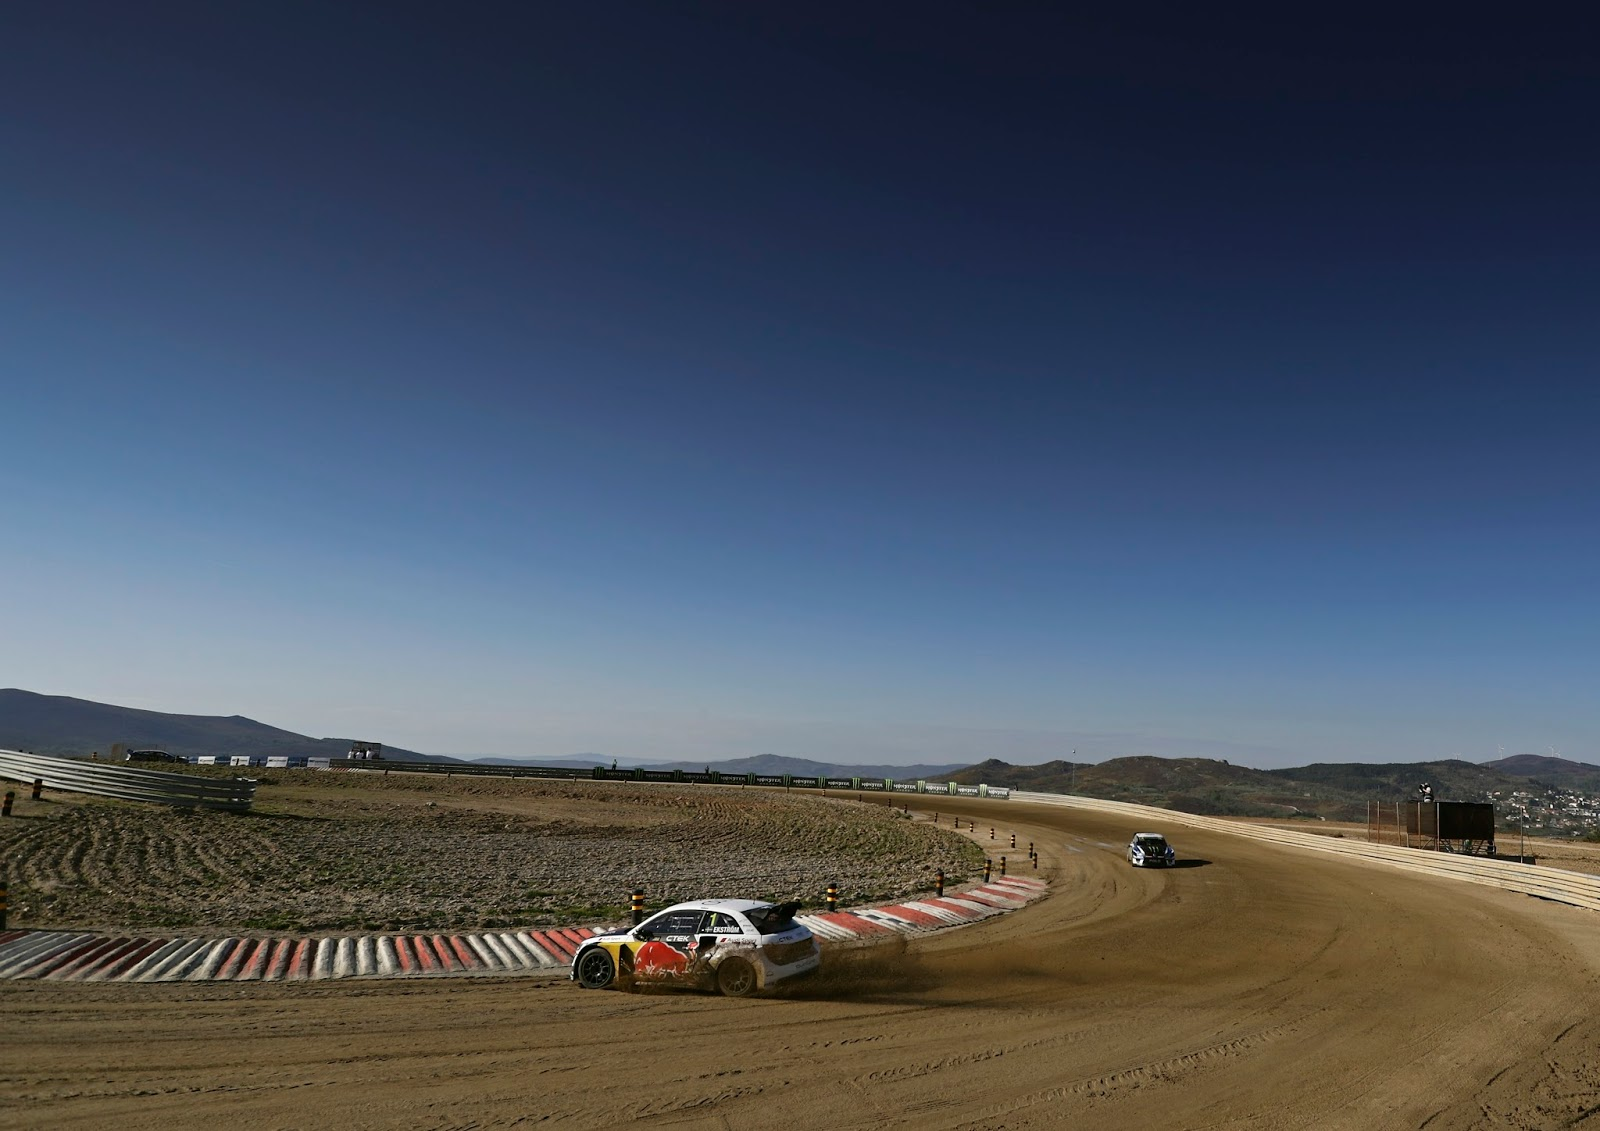 A173377 large 1 Δες όλο τον αγώνα του συναρπαστικού Rallycross FIA, FIA World Rallycross Championship, Rally, videos, World RX